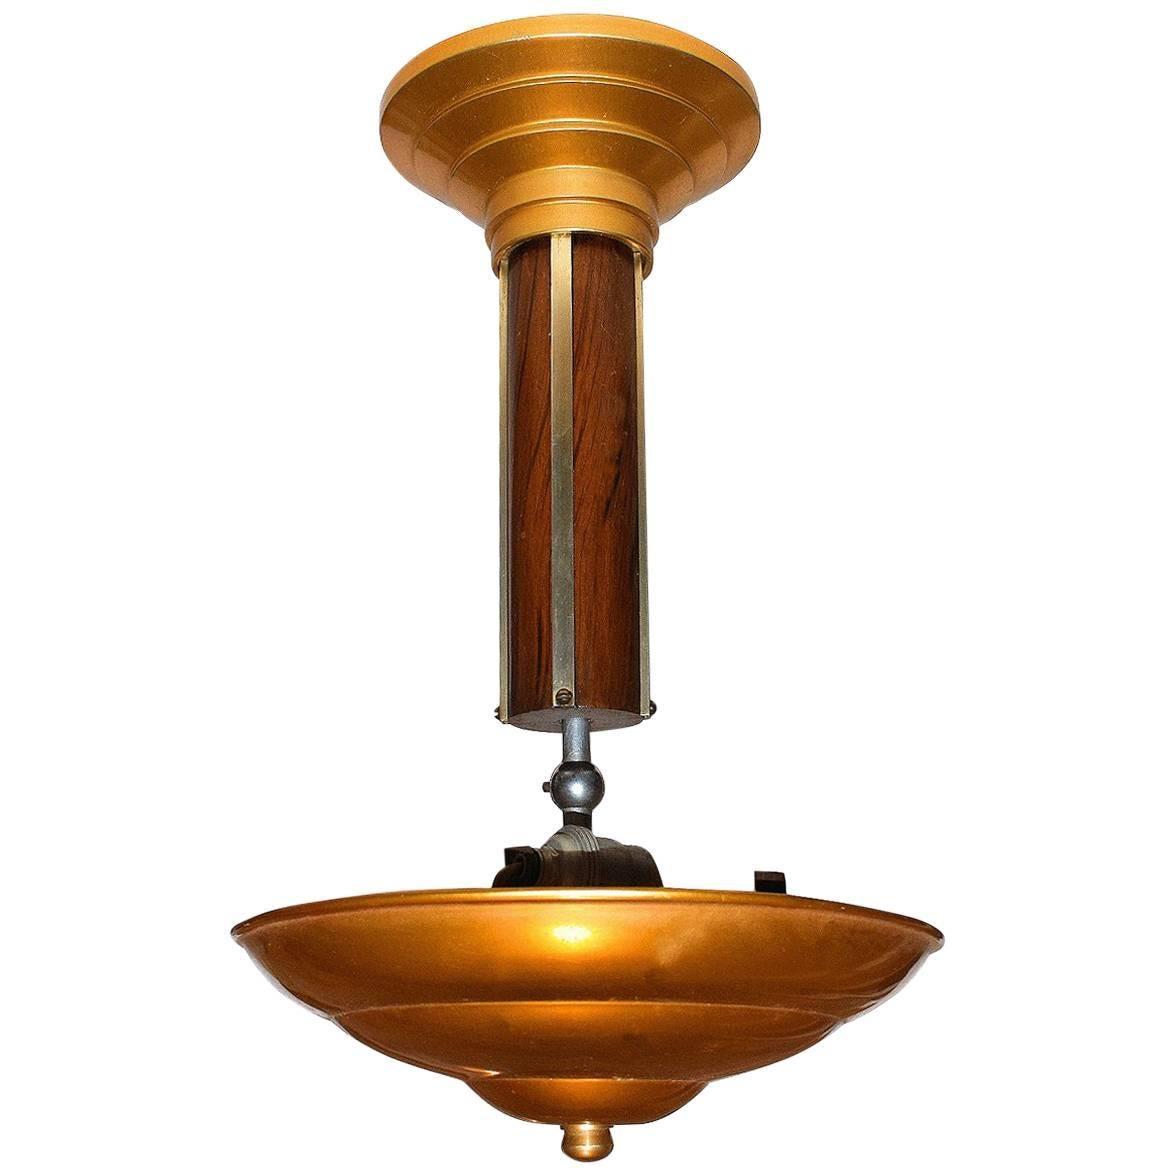 1930s Art Deco French Ceiling Light